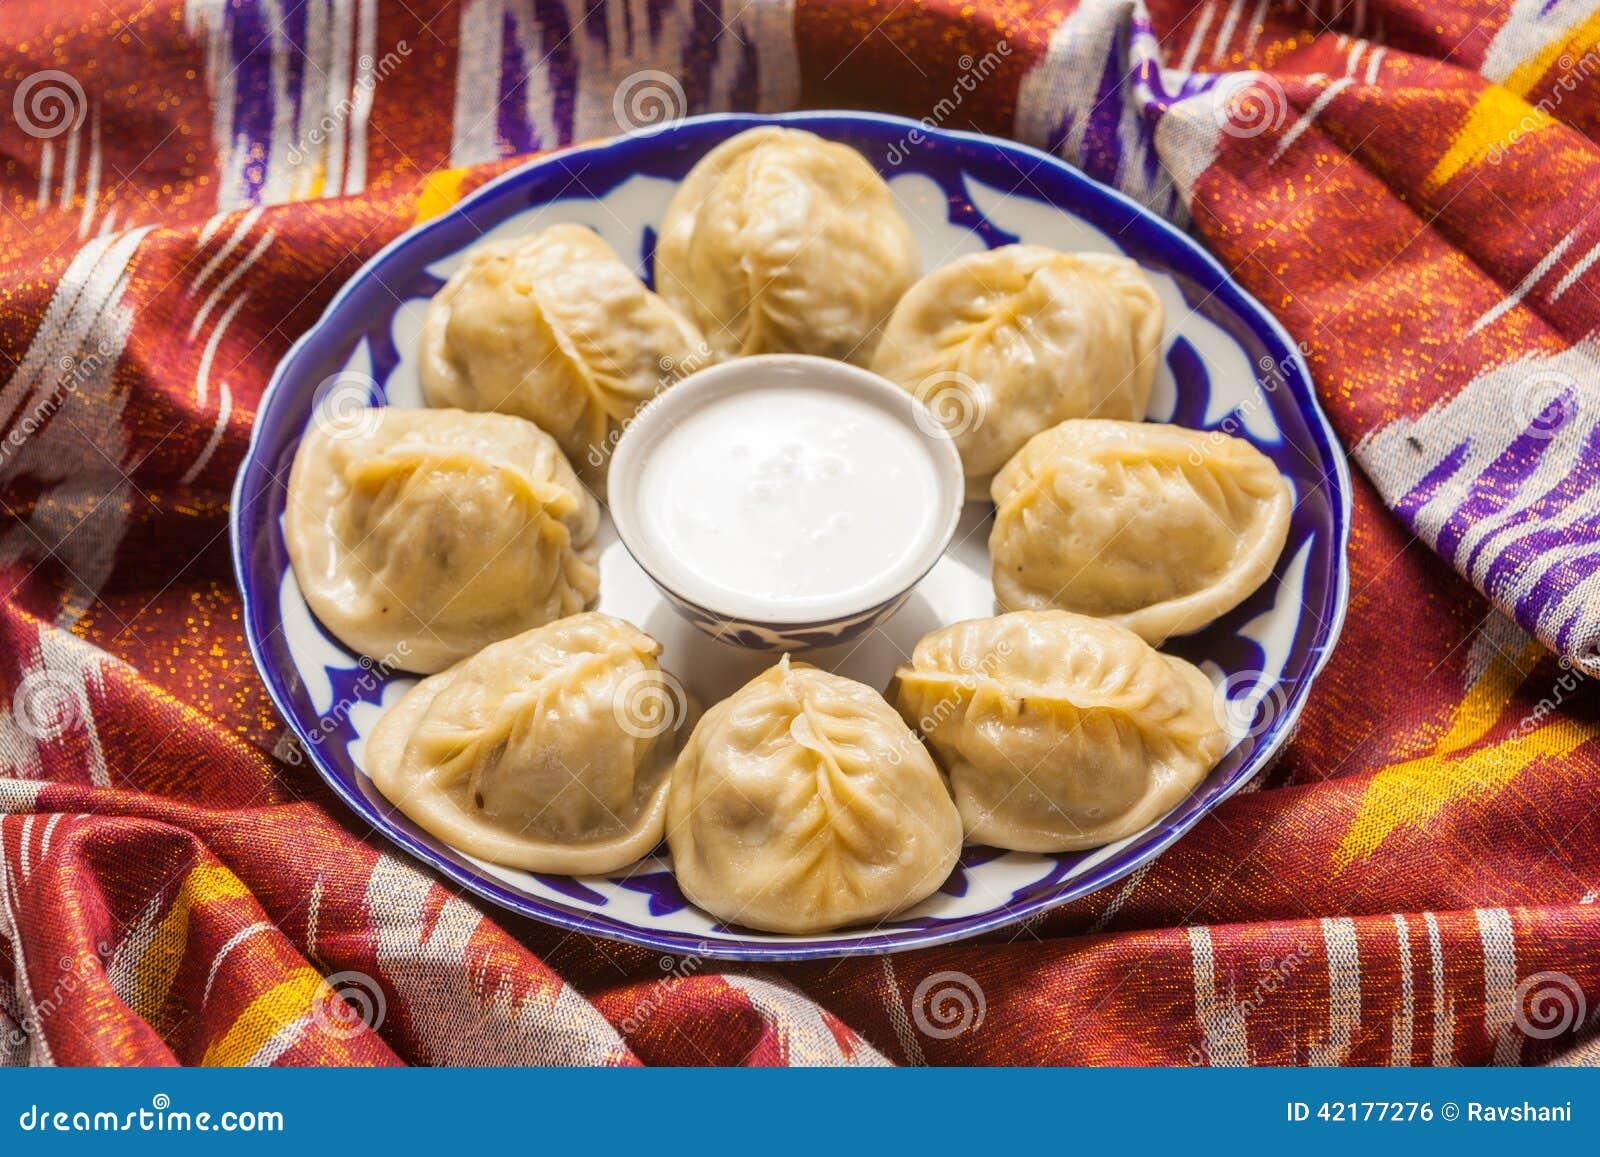 Uzbek National Food Manti On Traditional Fabric Adras Stock Photo